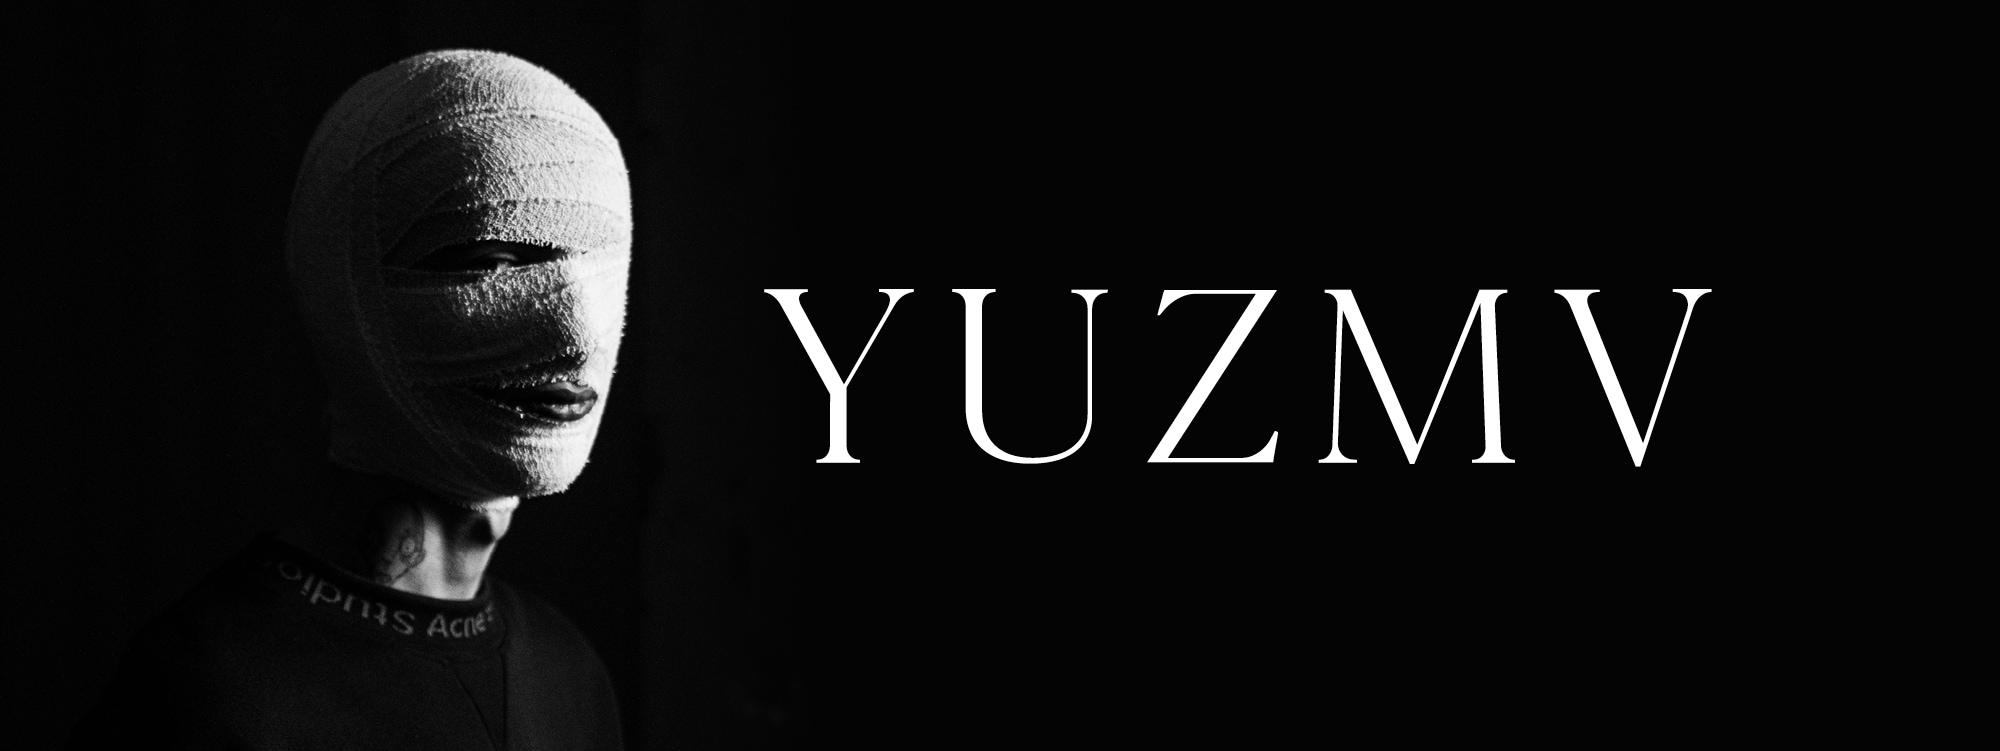 YUZMV_tournee